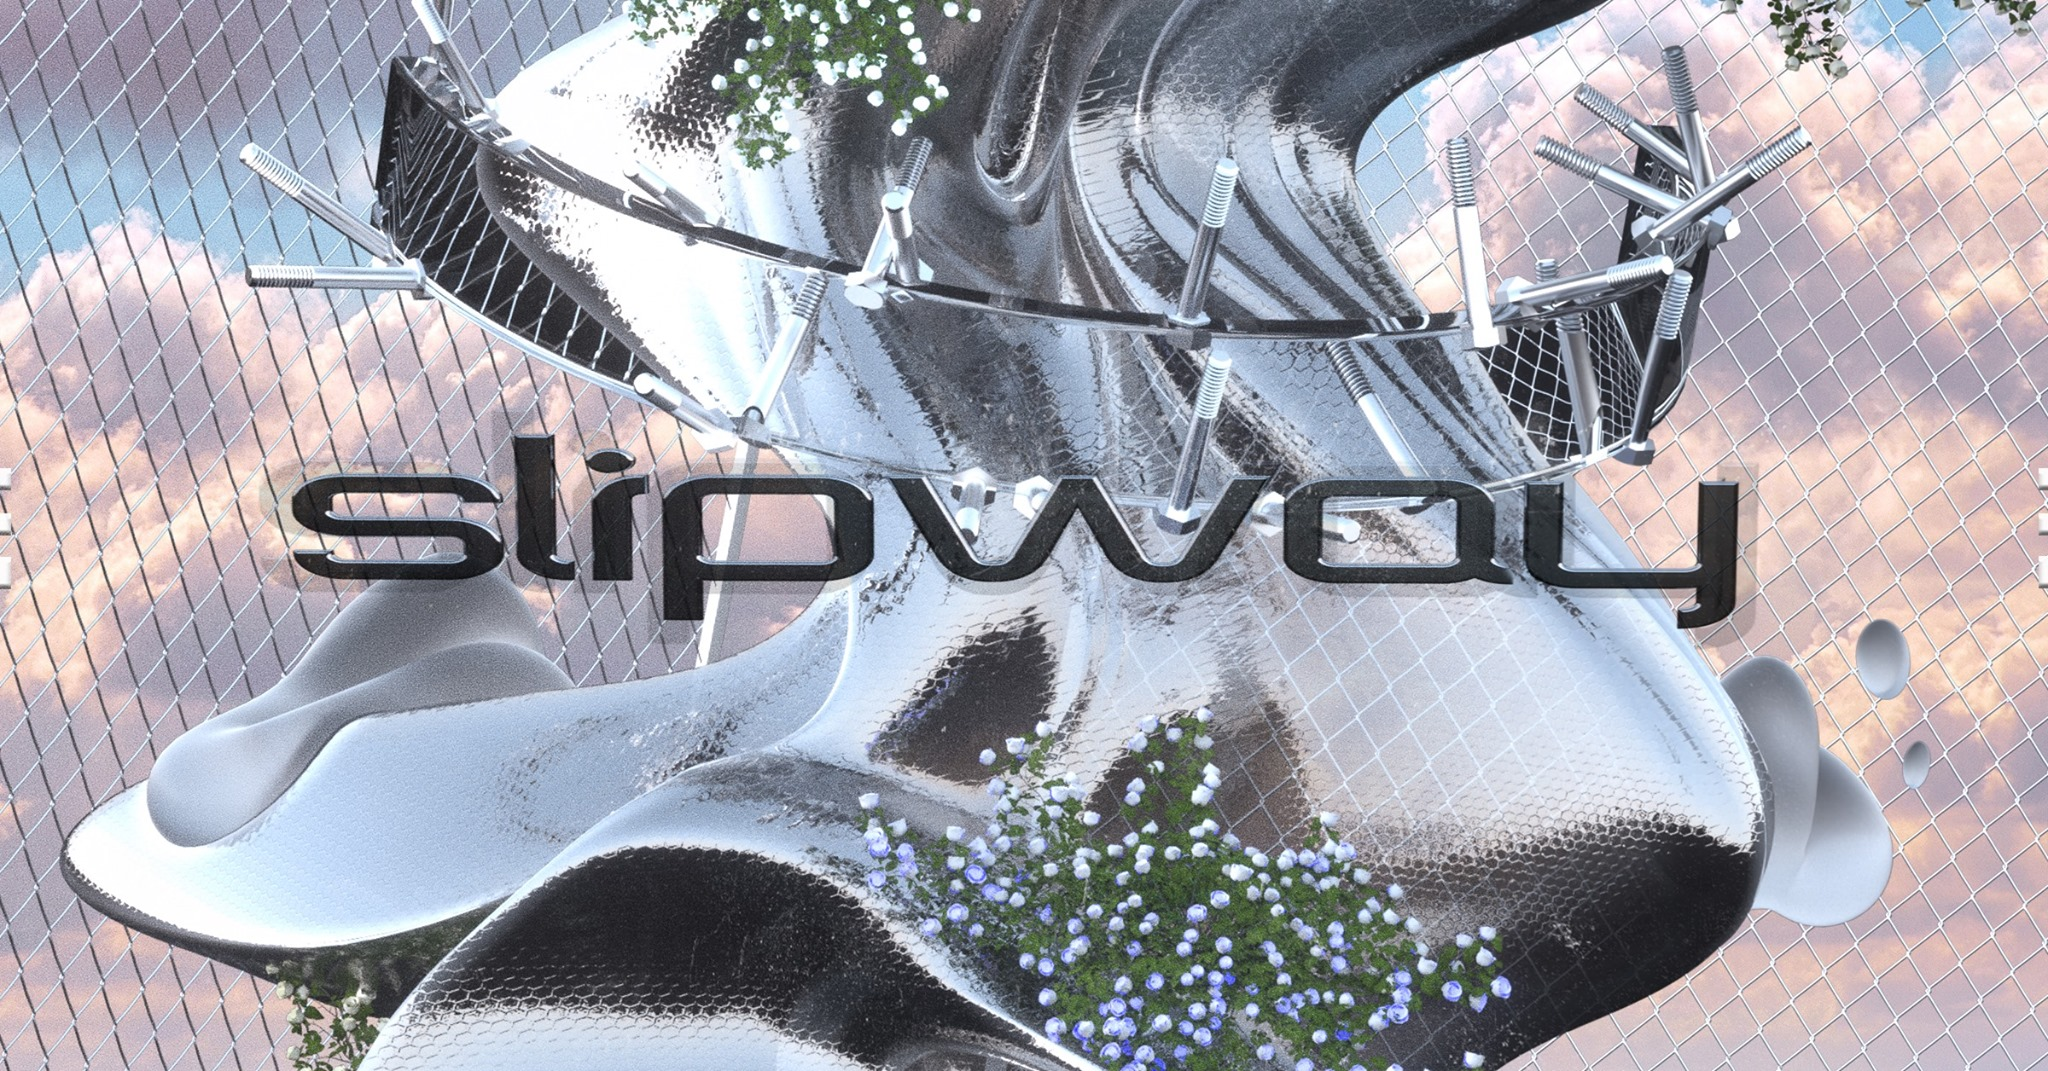 Slipway Paluch X Pro8l3m X Otsochodzi X schafter X Gedz X Coals